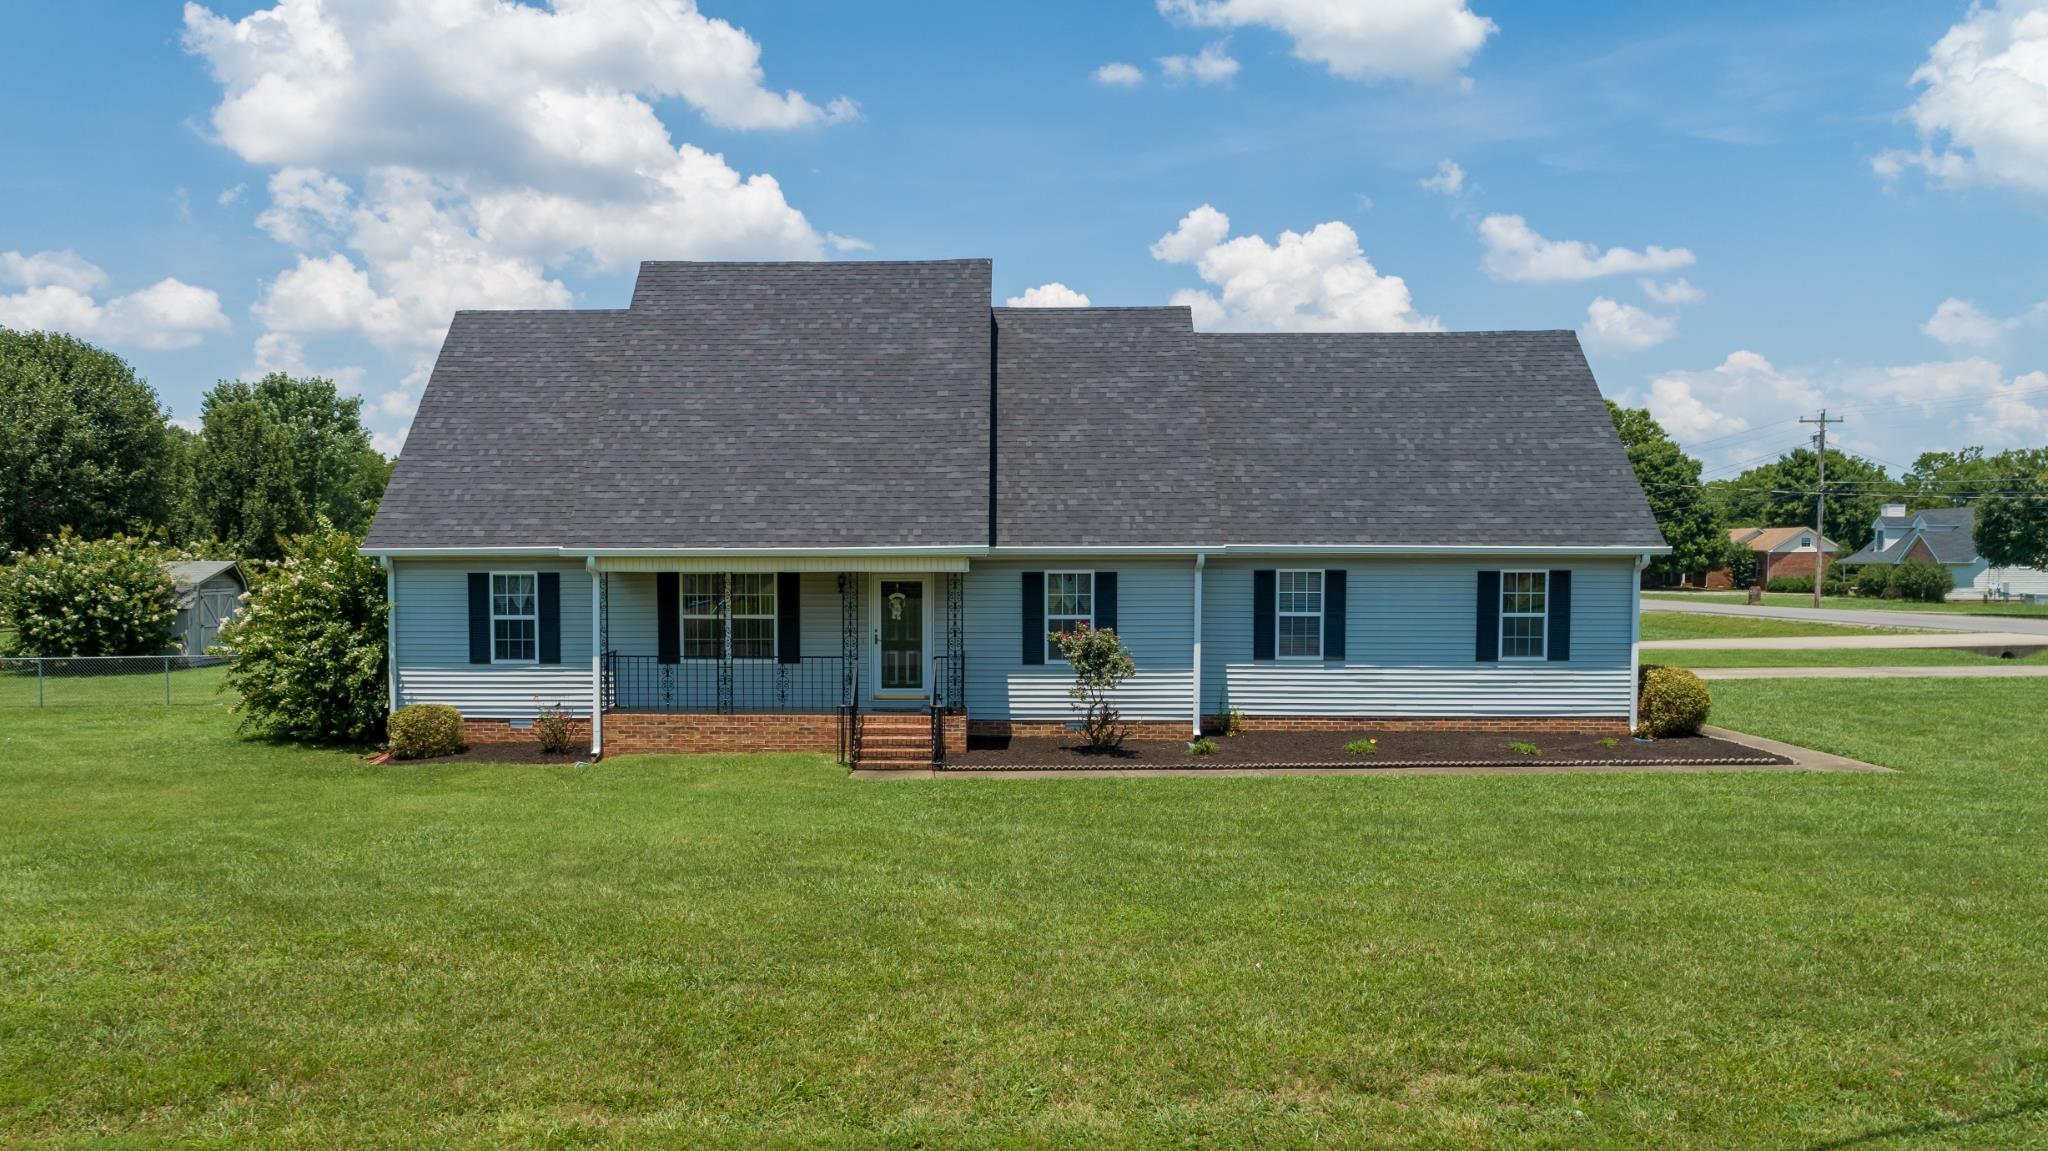 602 Hogan Dr, Murfreesboro, TN 37128 - Murfreesboro, TN real estate listing